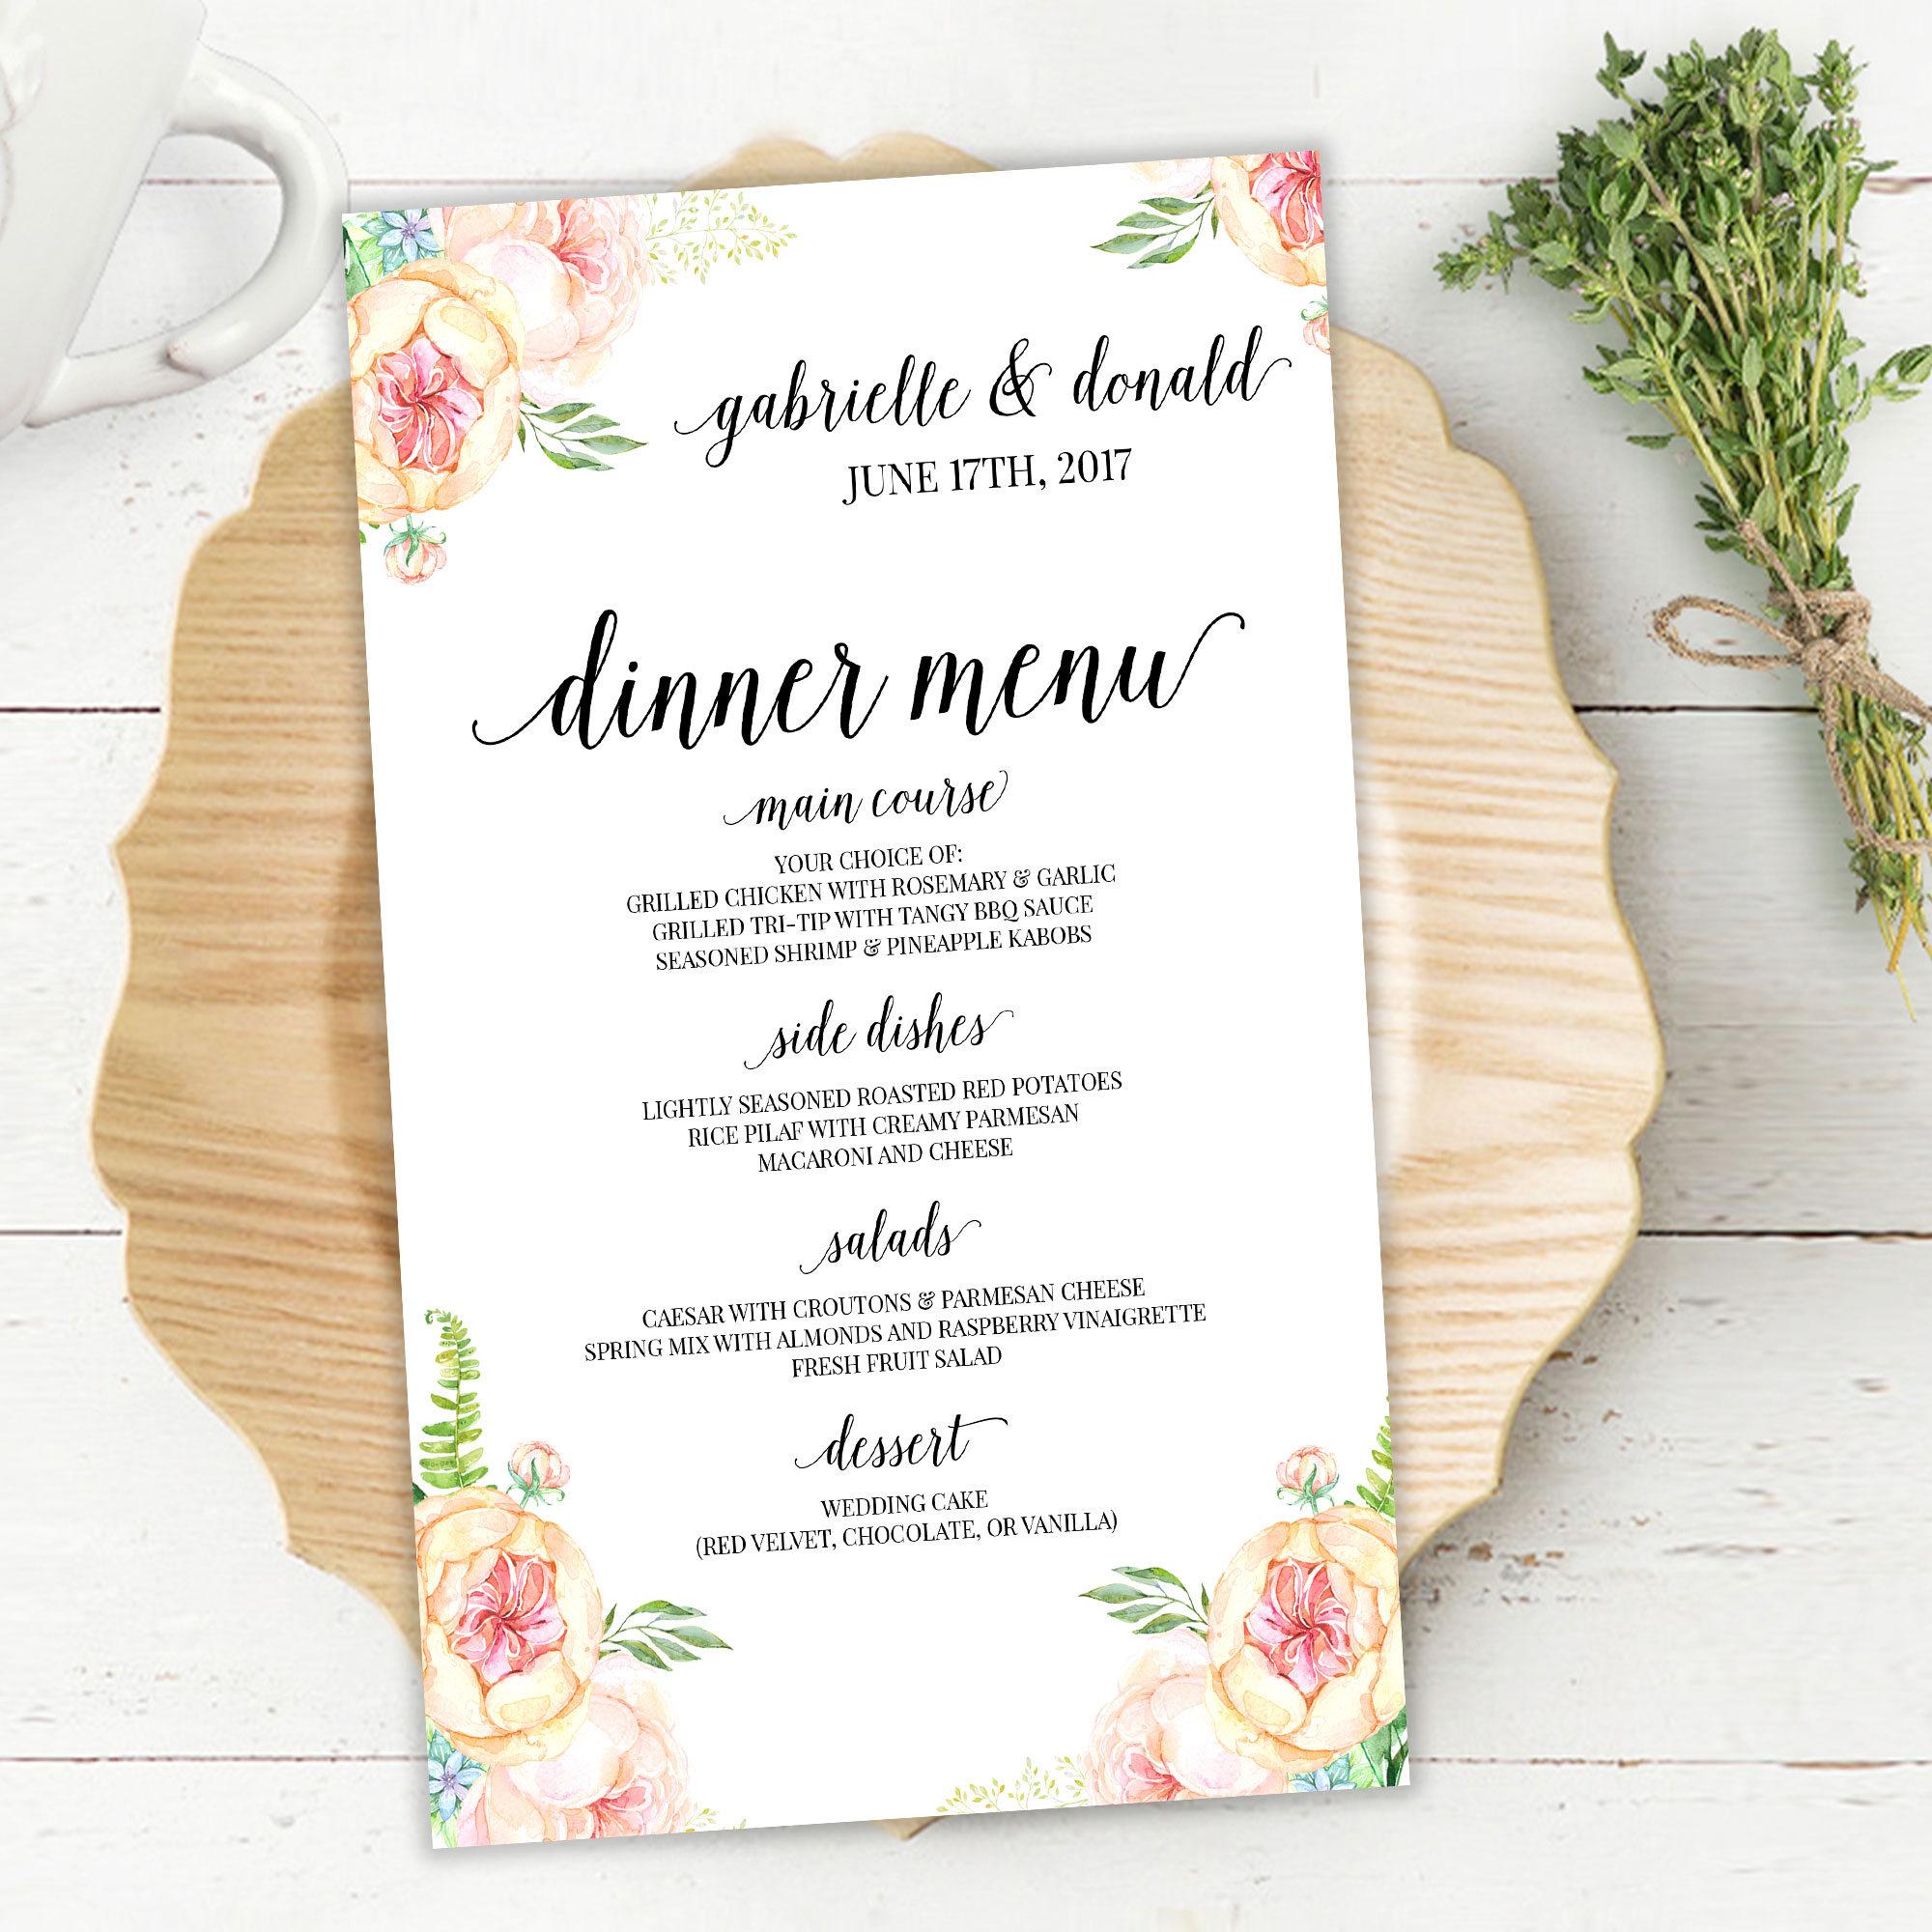 Wedding Reception Food Menu: Printable Wedding Reception Menu, Dinner Menu, Blush